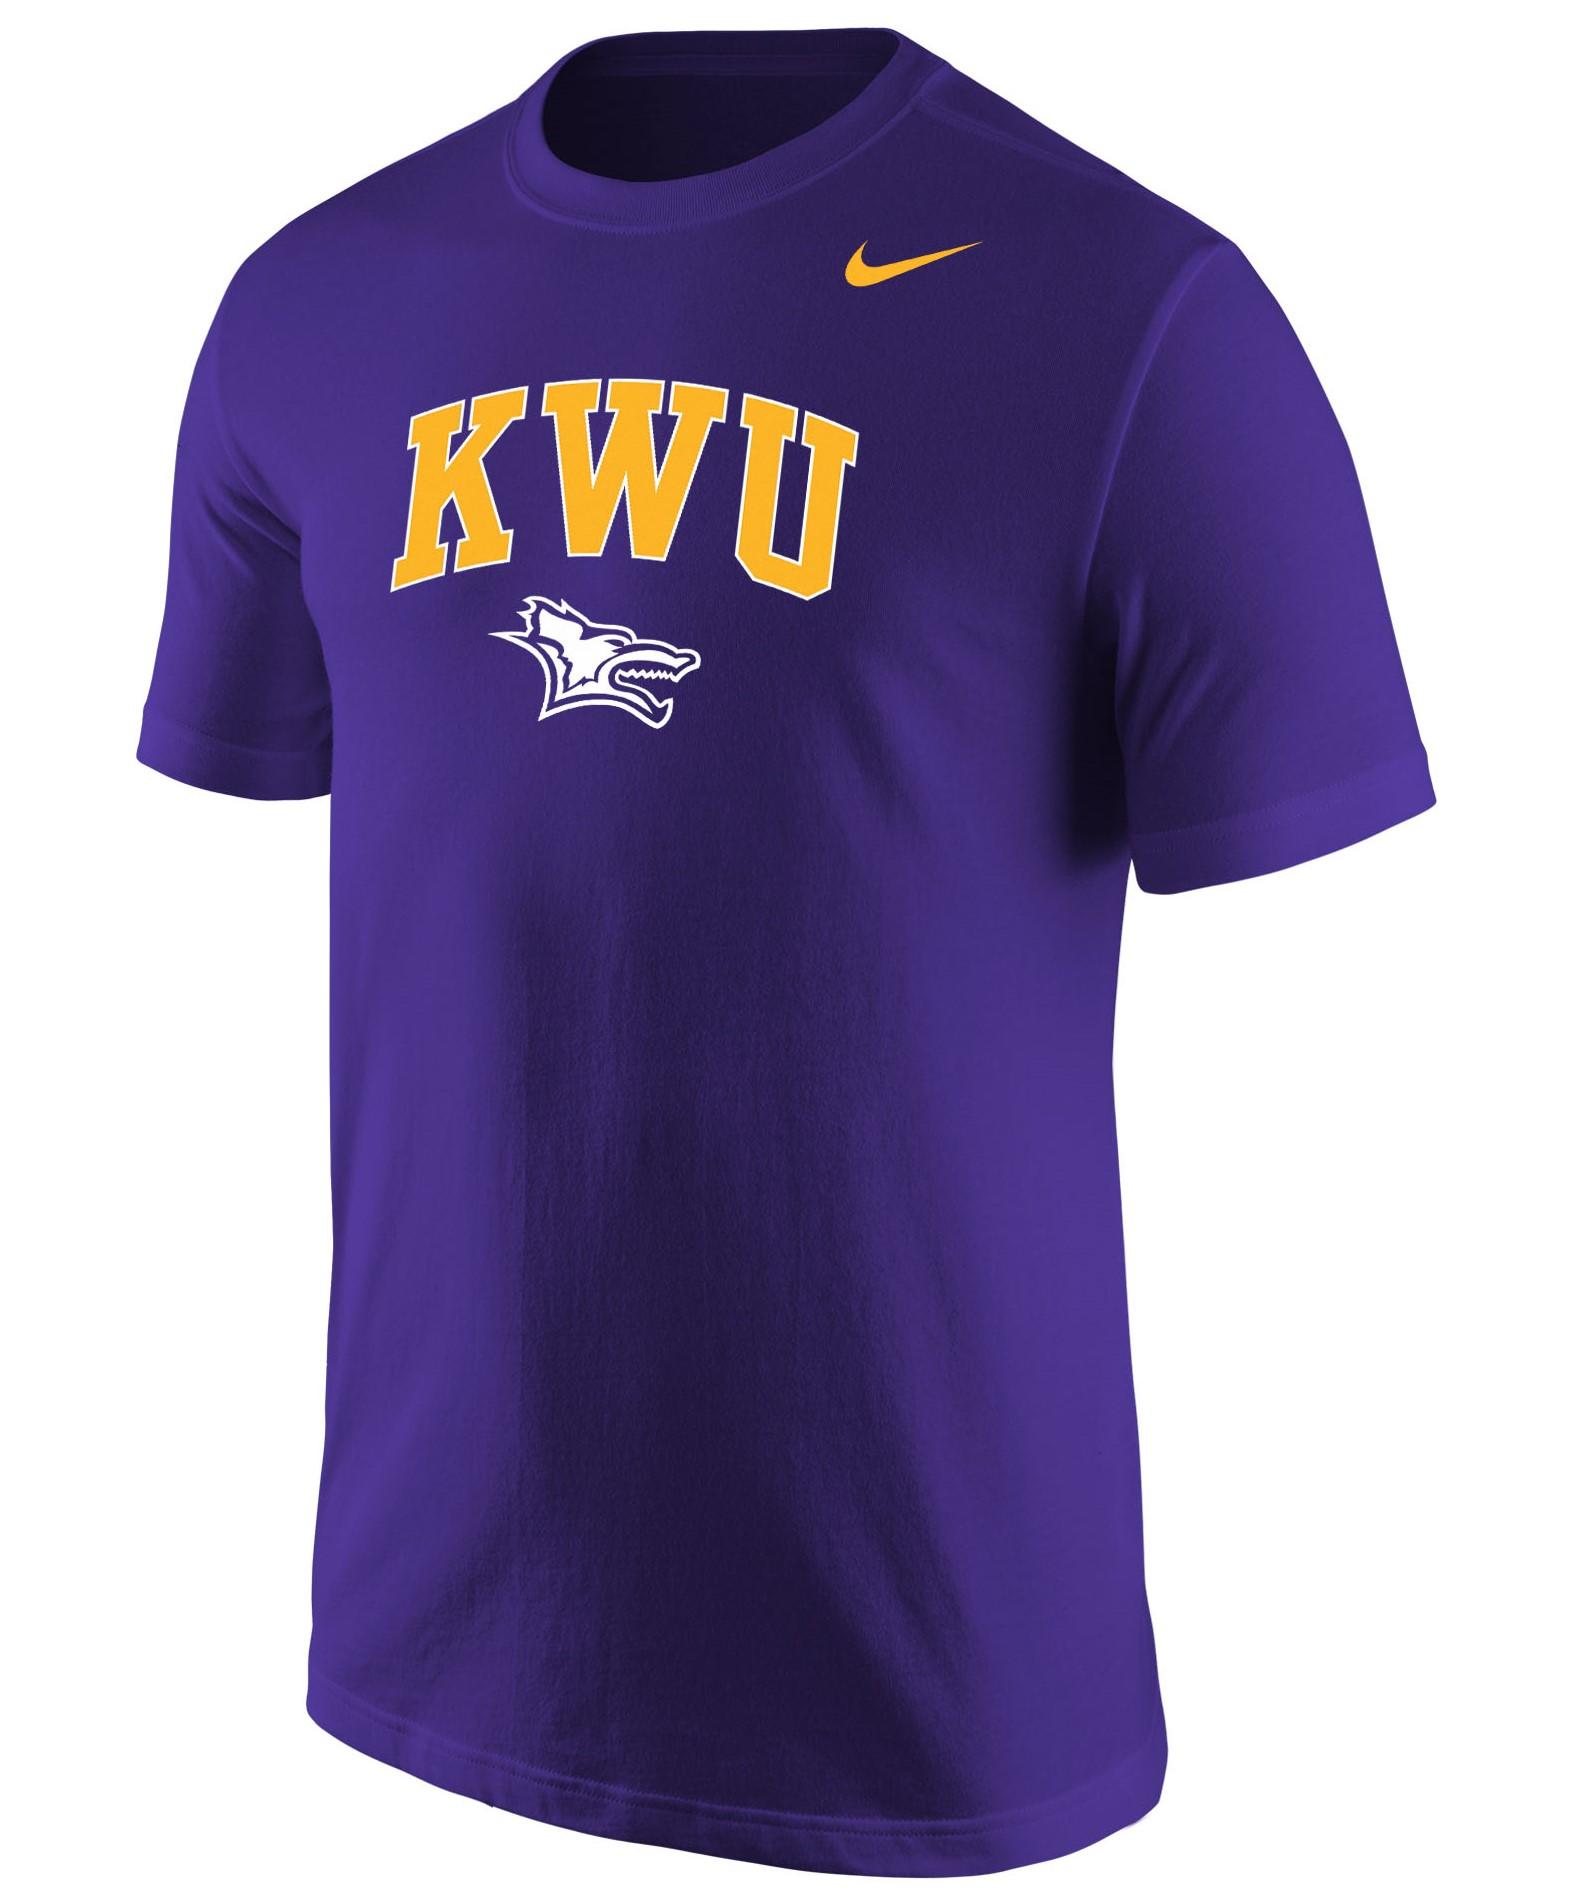 A Purple Shirt